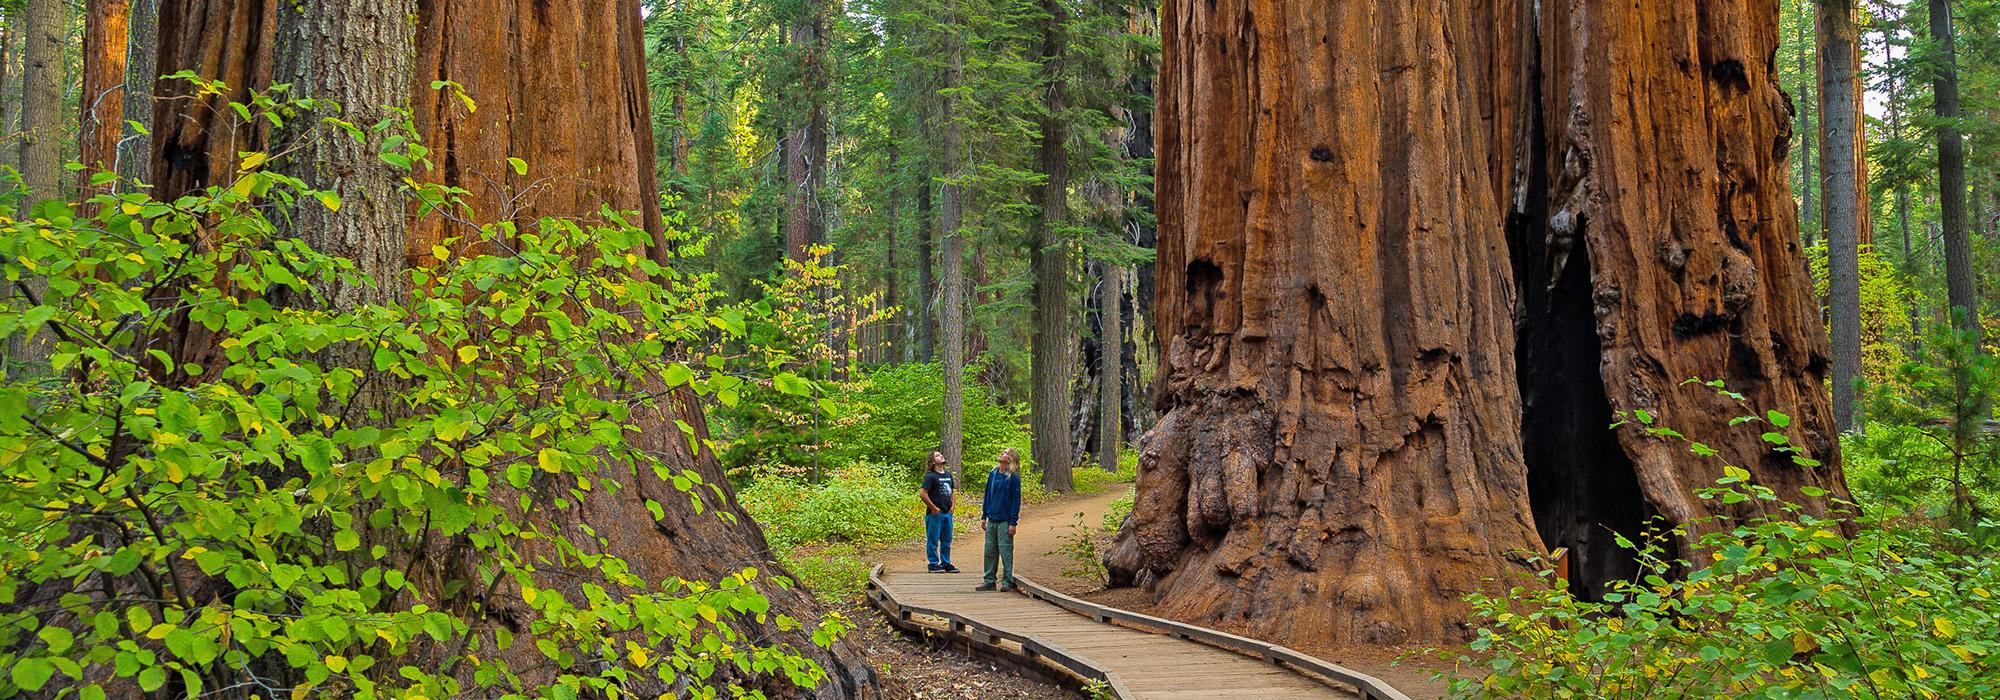 CA_GiantSequoiaRange_Calaveras_North_Grove_byMaxForster_2019_Hero.jpg